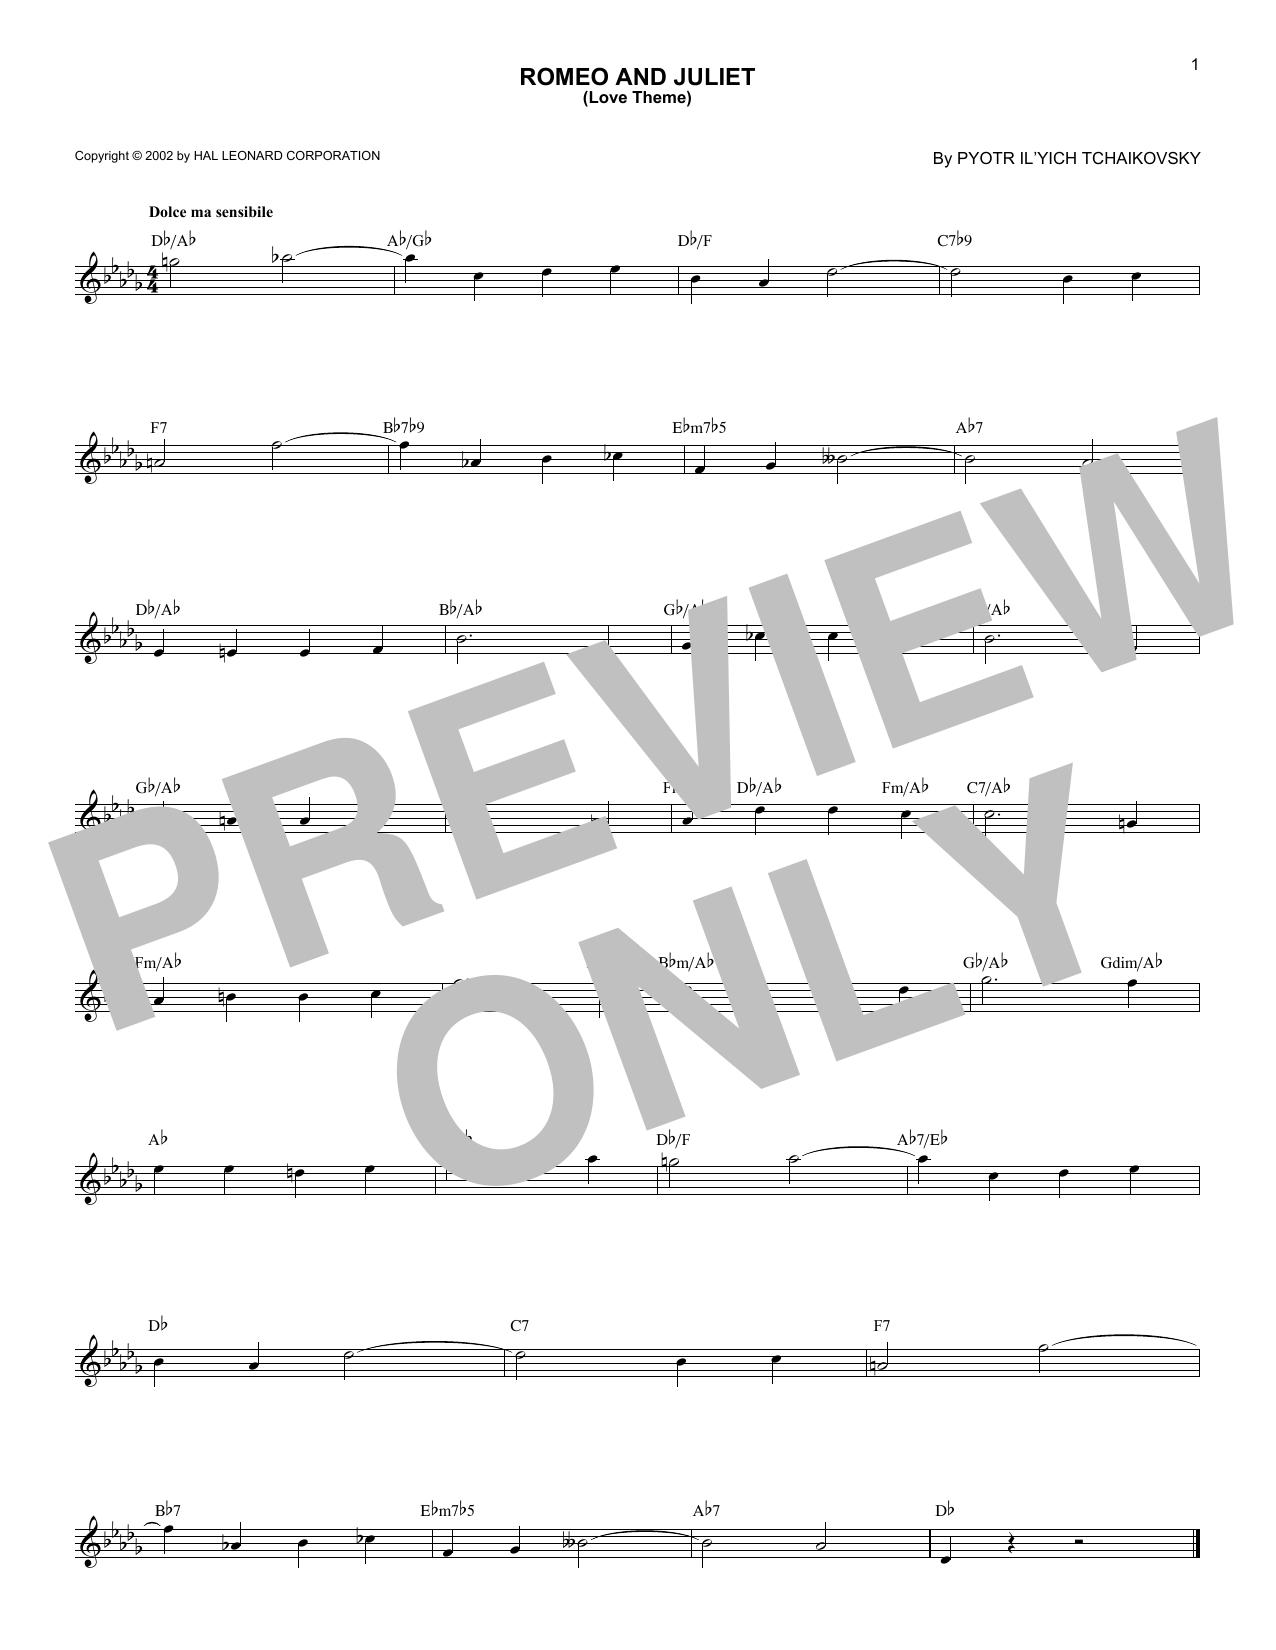 Romeo And Juliet (Love Theme) (Melody Line, Lyrics & Chords)